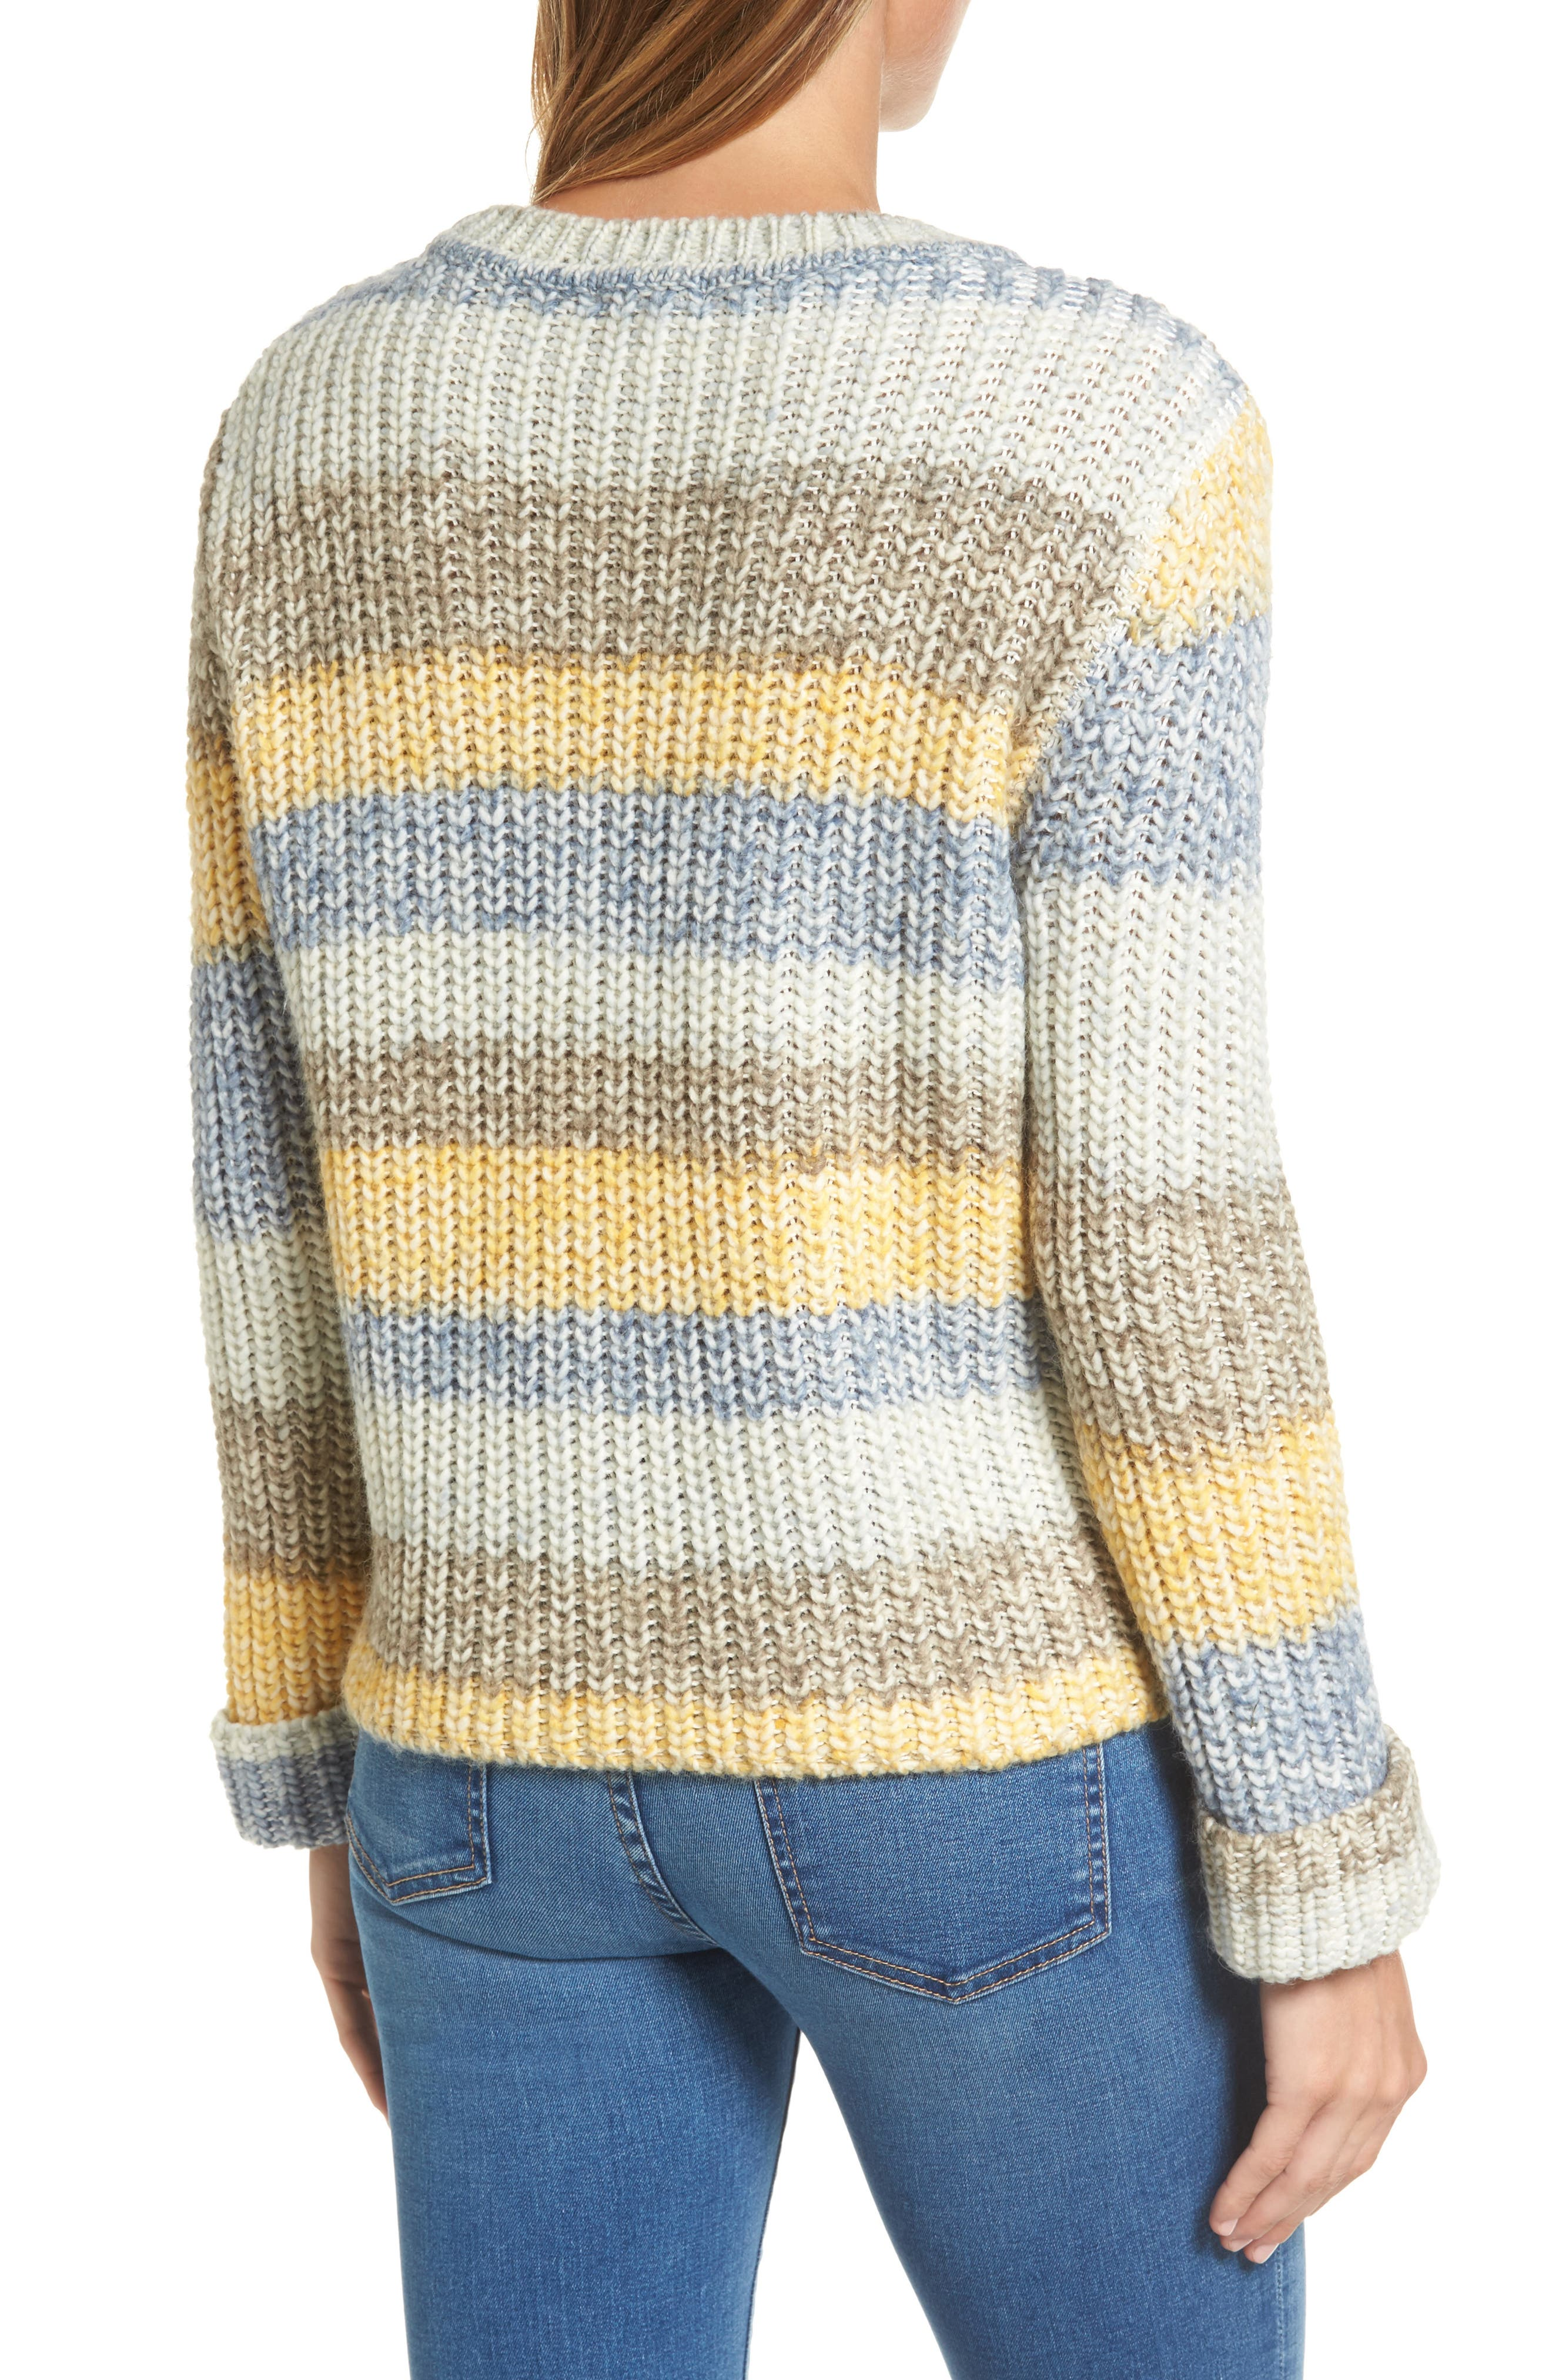 Alternate Image 2  - Barbour Hive Knit Fisherman Sweater